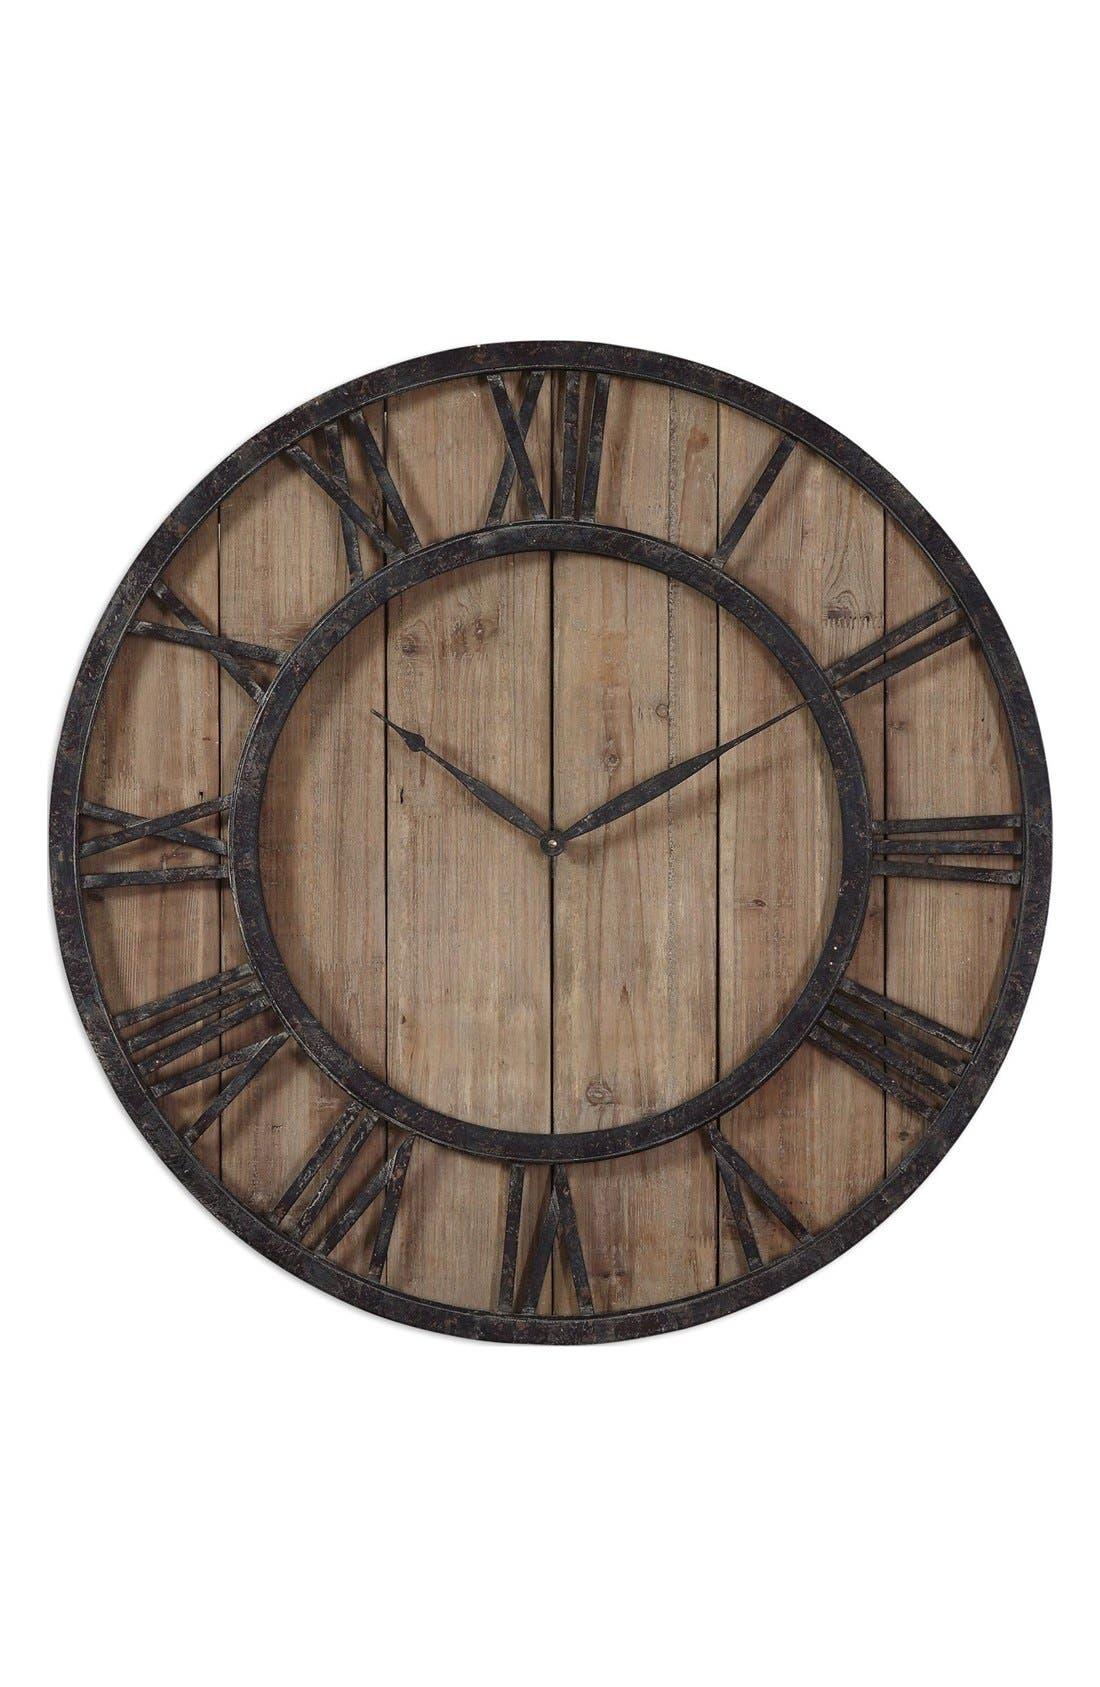 'Powell' Wooden Wall Clock,                             Main thumbnail 1, color,                             200